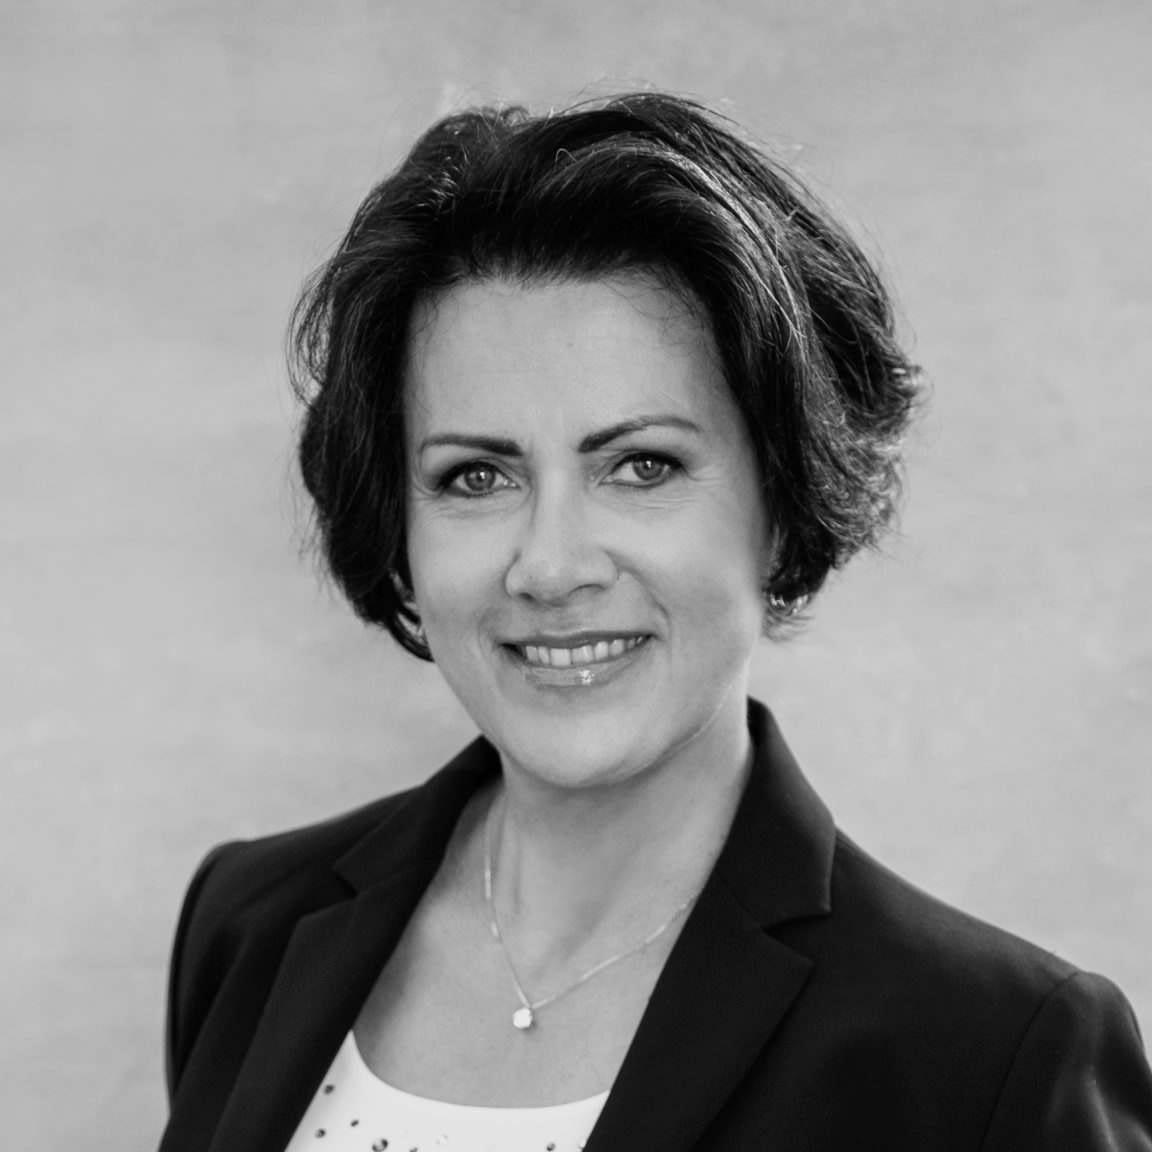 Christine Landrevot